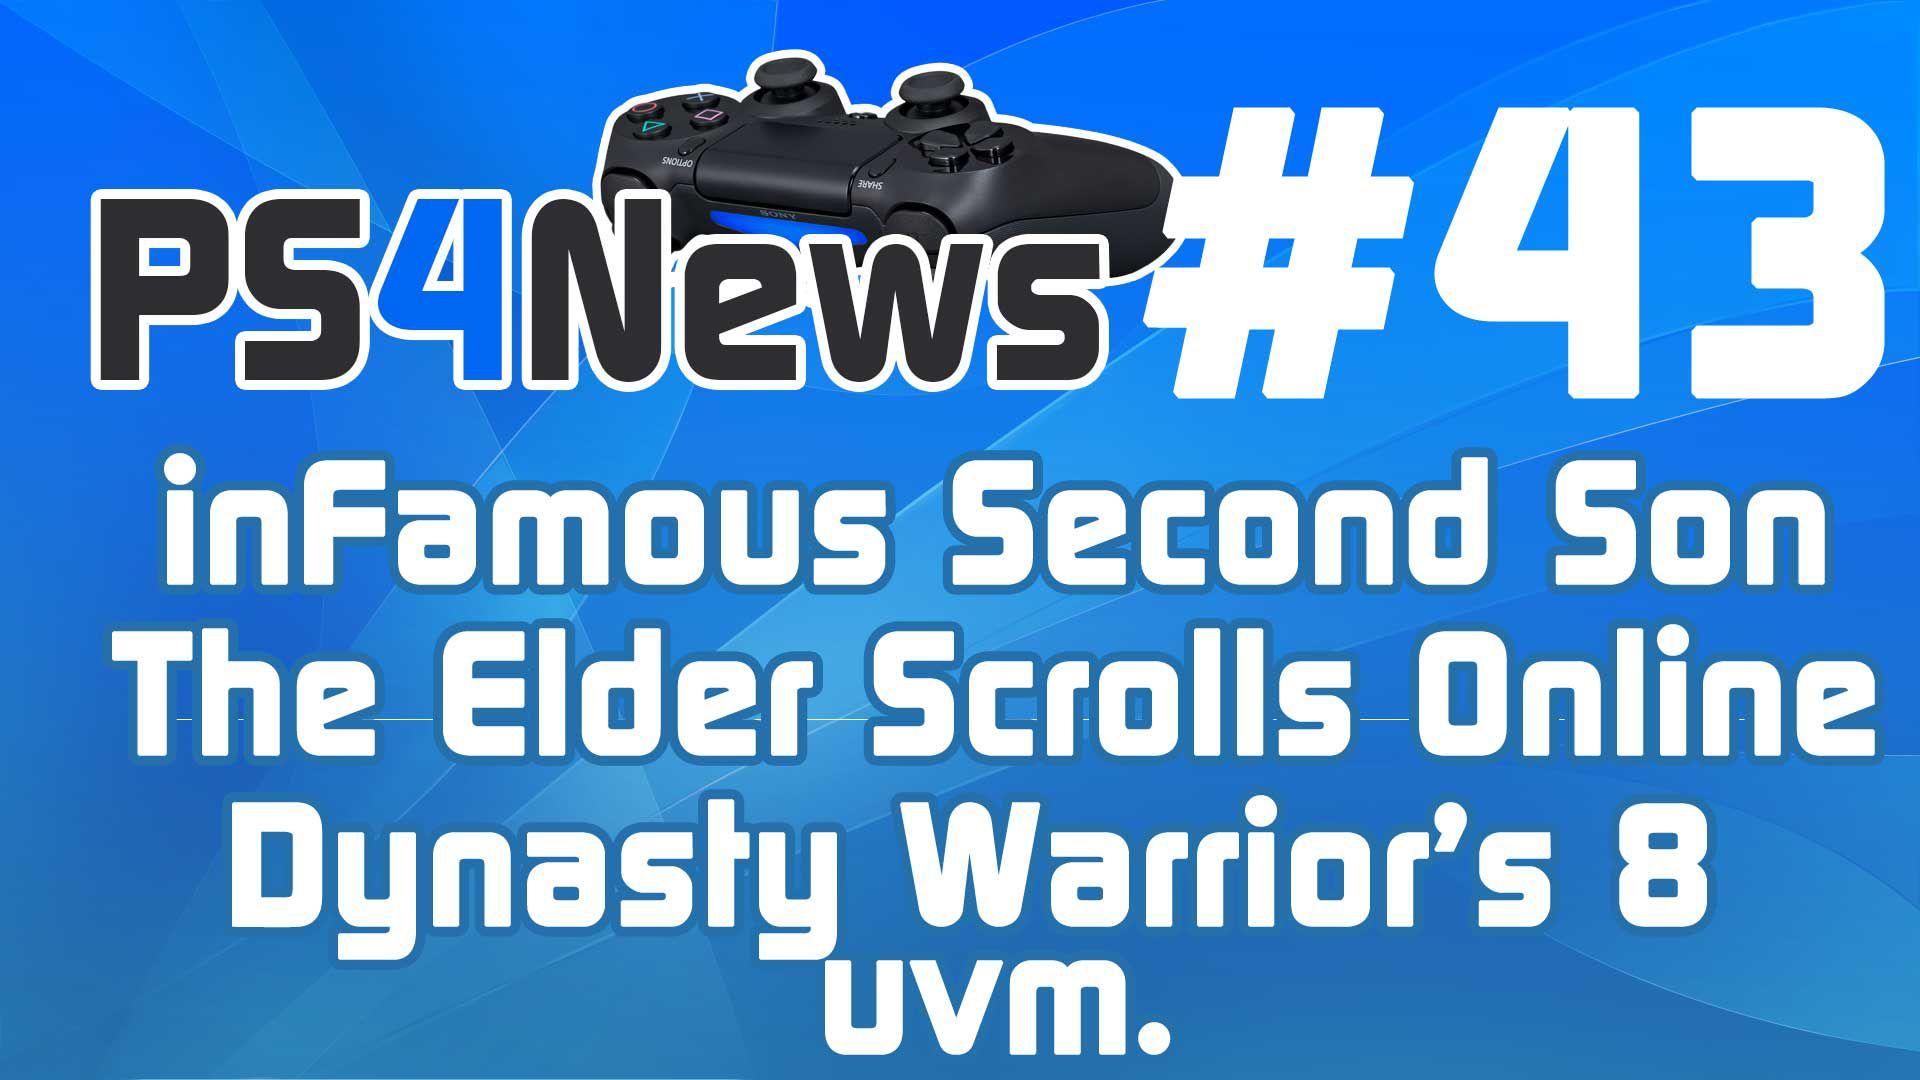 inFamous Second Son, The Elder Scrolls Online, Dynasty Warrior's 8 uvm.